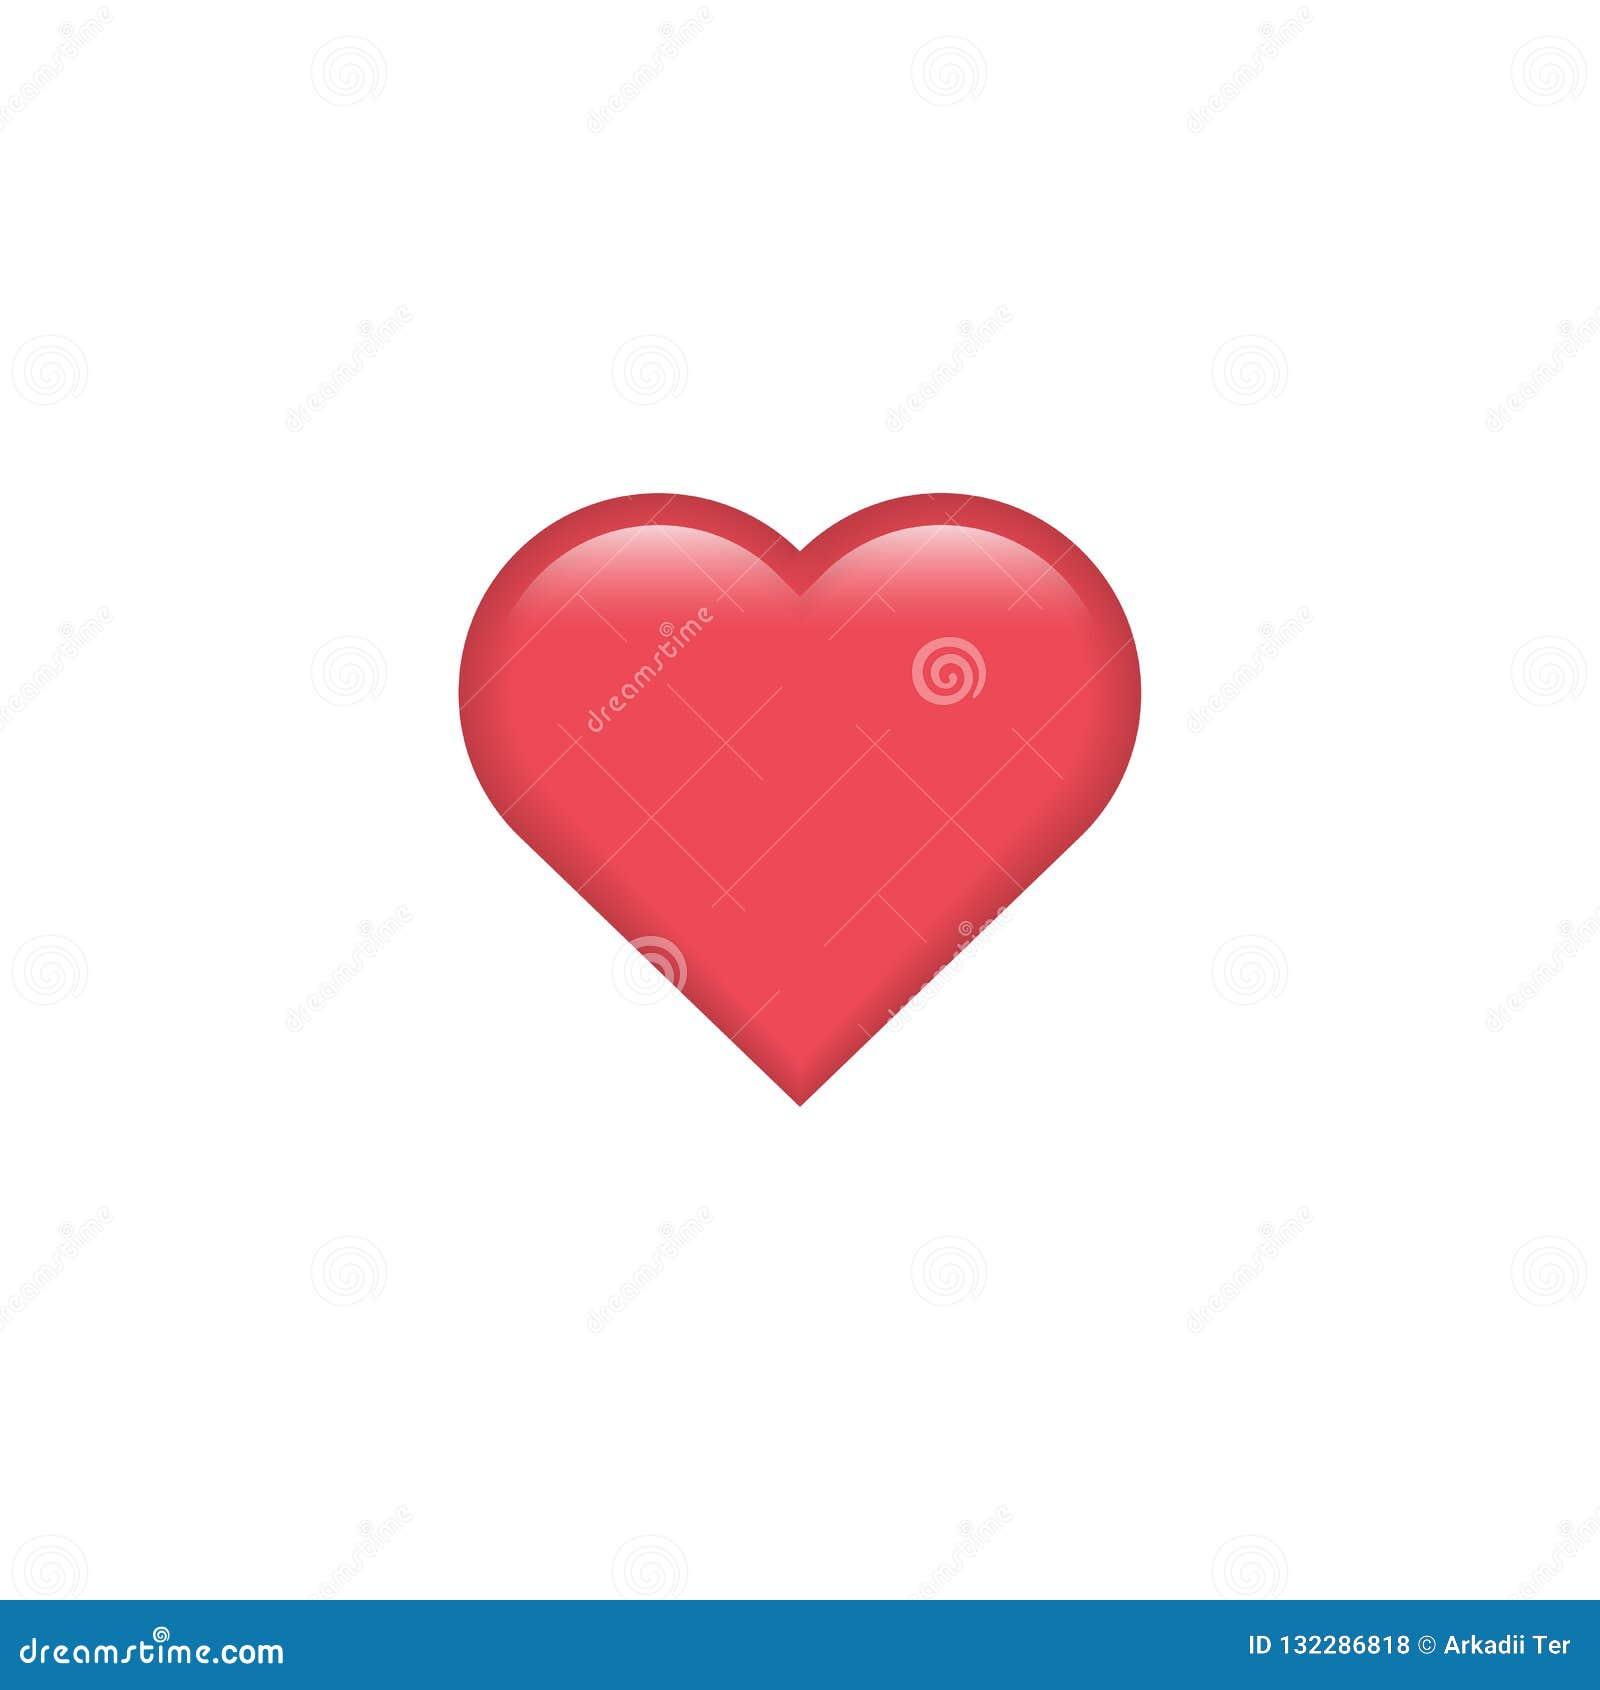 Red Vector Heart Icon. Heart Emoji. Heart Sticker. Love